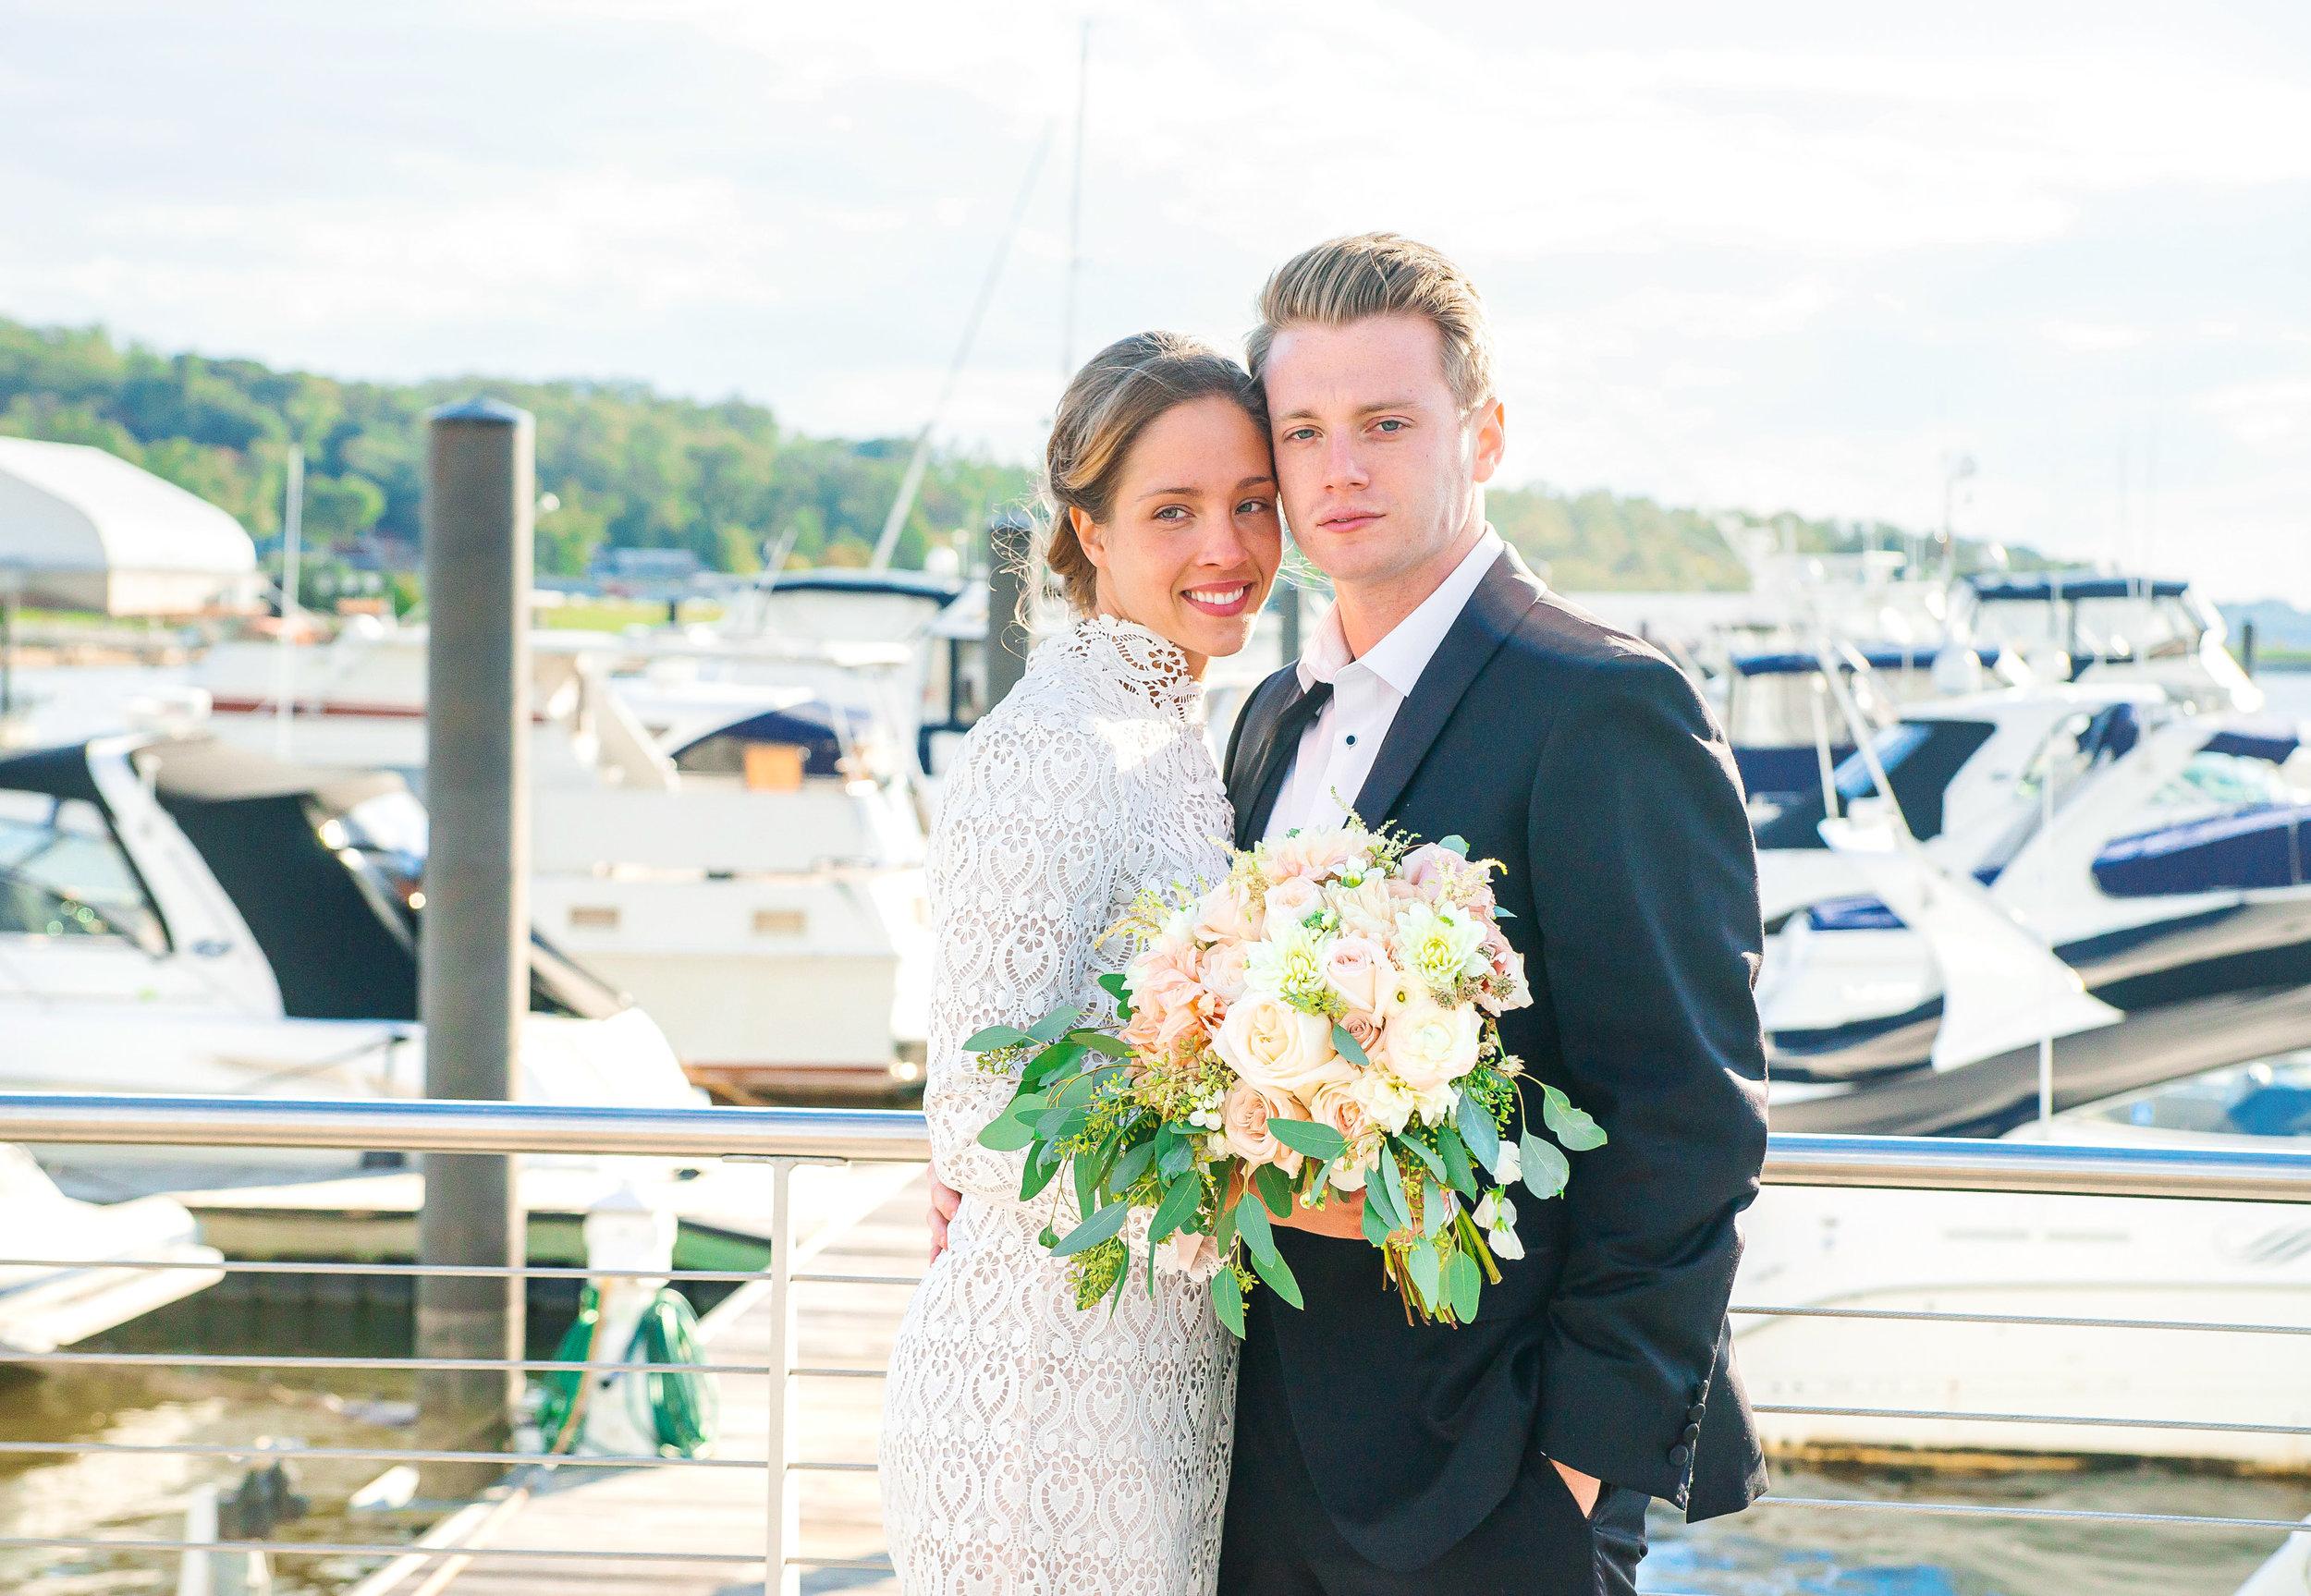 Bride and groom photos at National Harbor ferris wheel by jessica nazarova